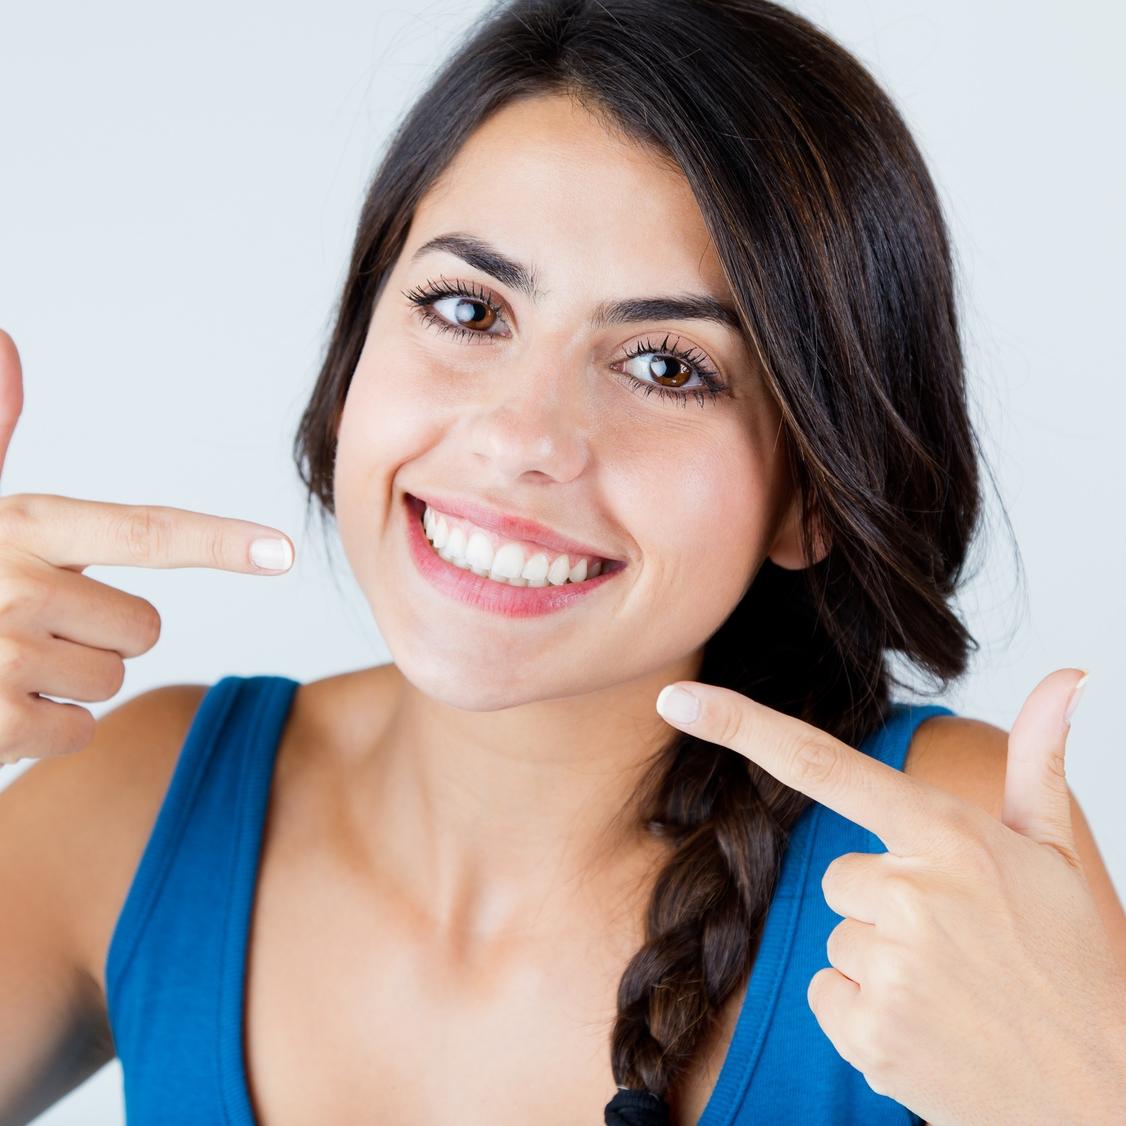 adult teeth straightening lady happy after cosmetic treatment biddulph